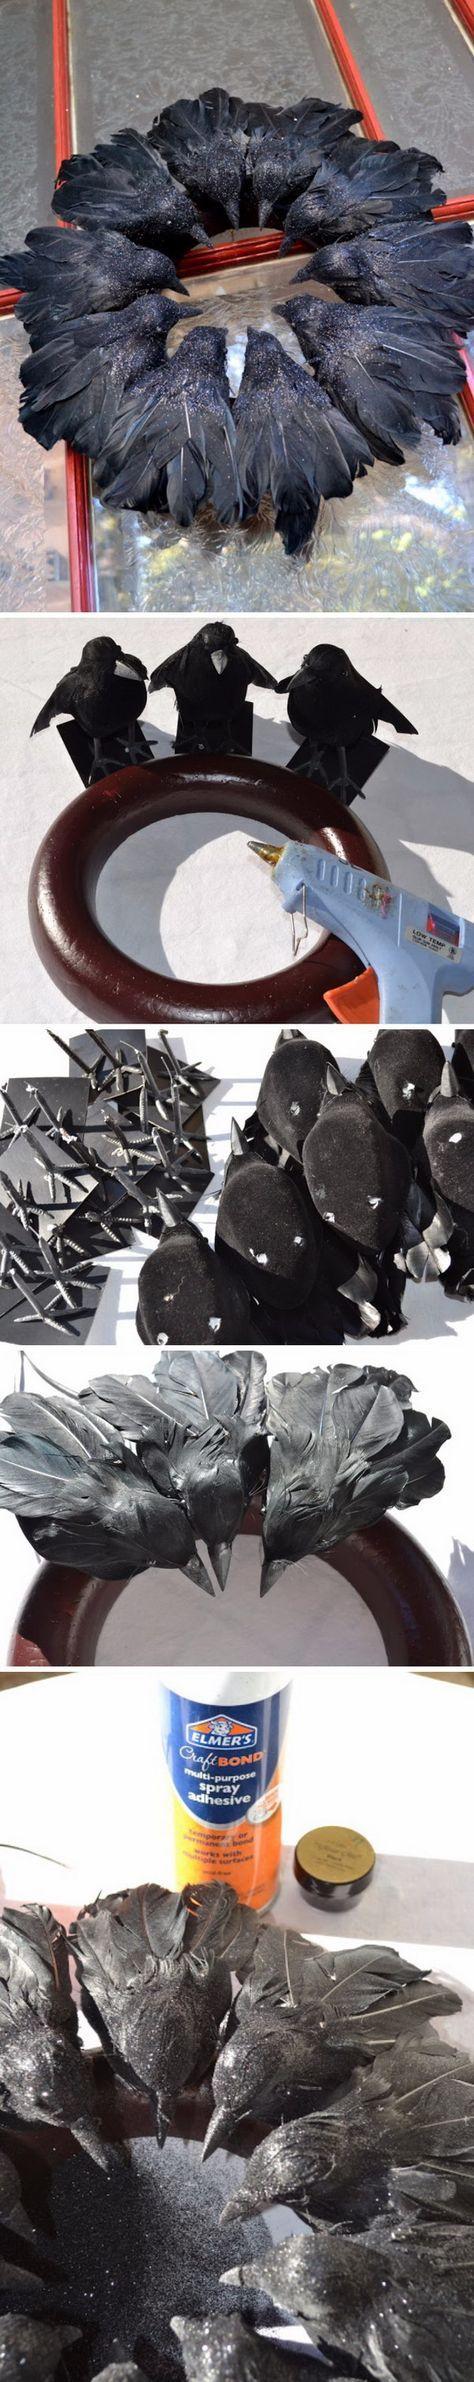 DIY Elegant Raven Wreath from Dollar Store Black Birds. More